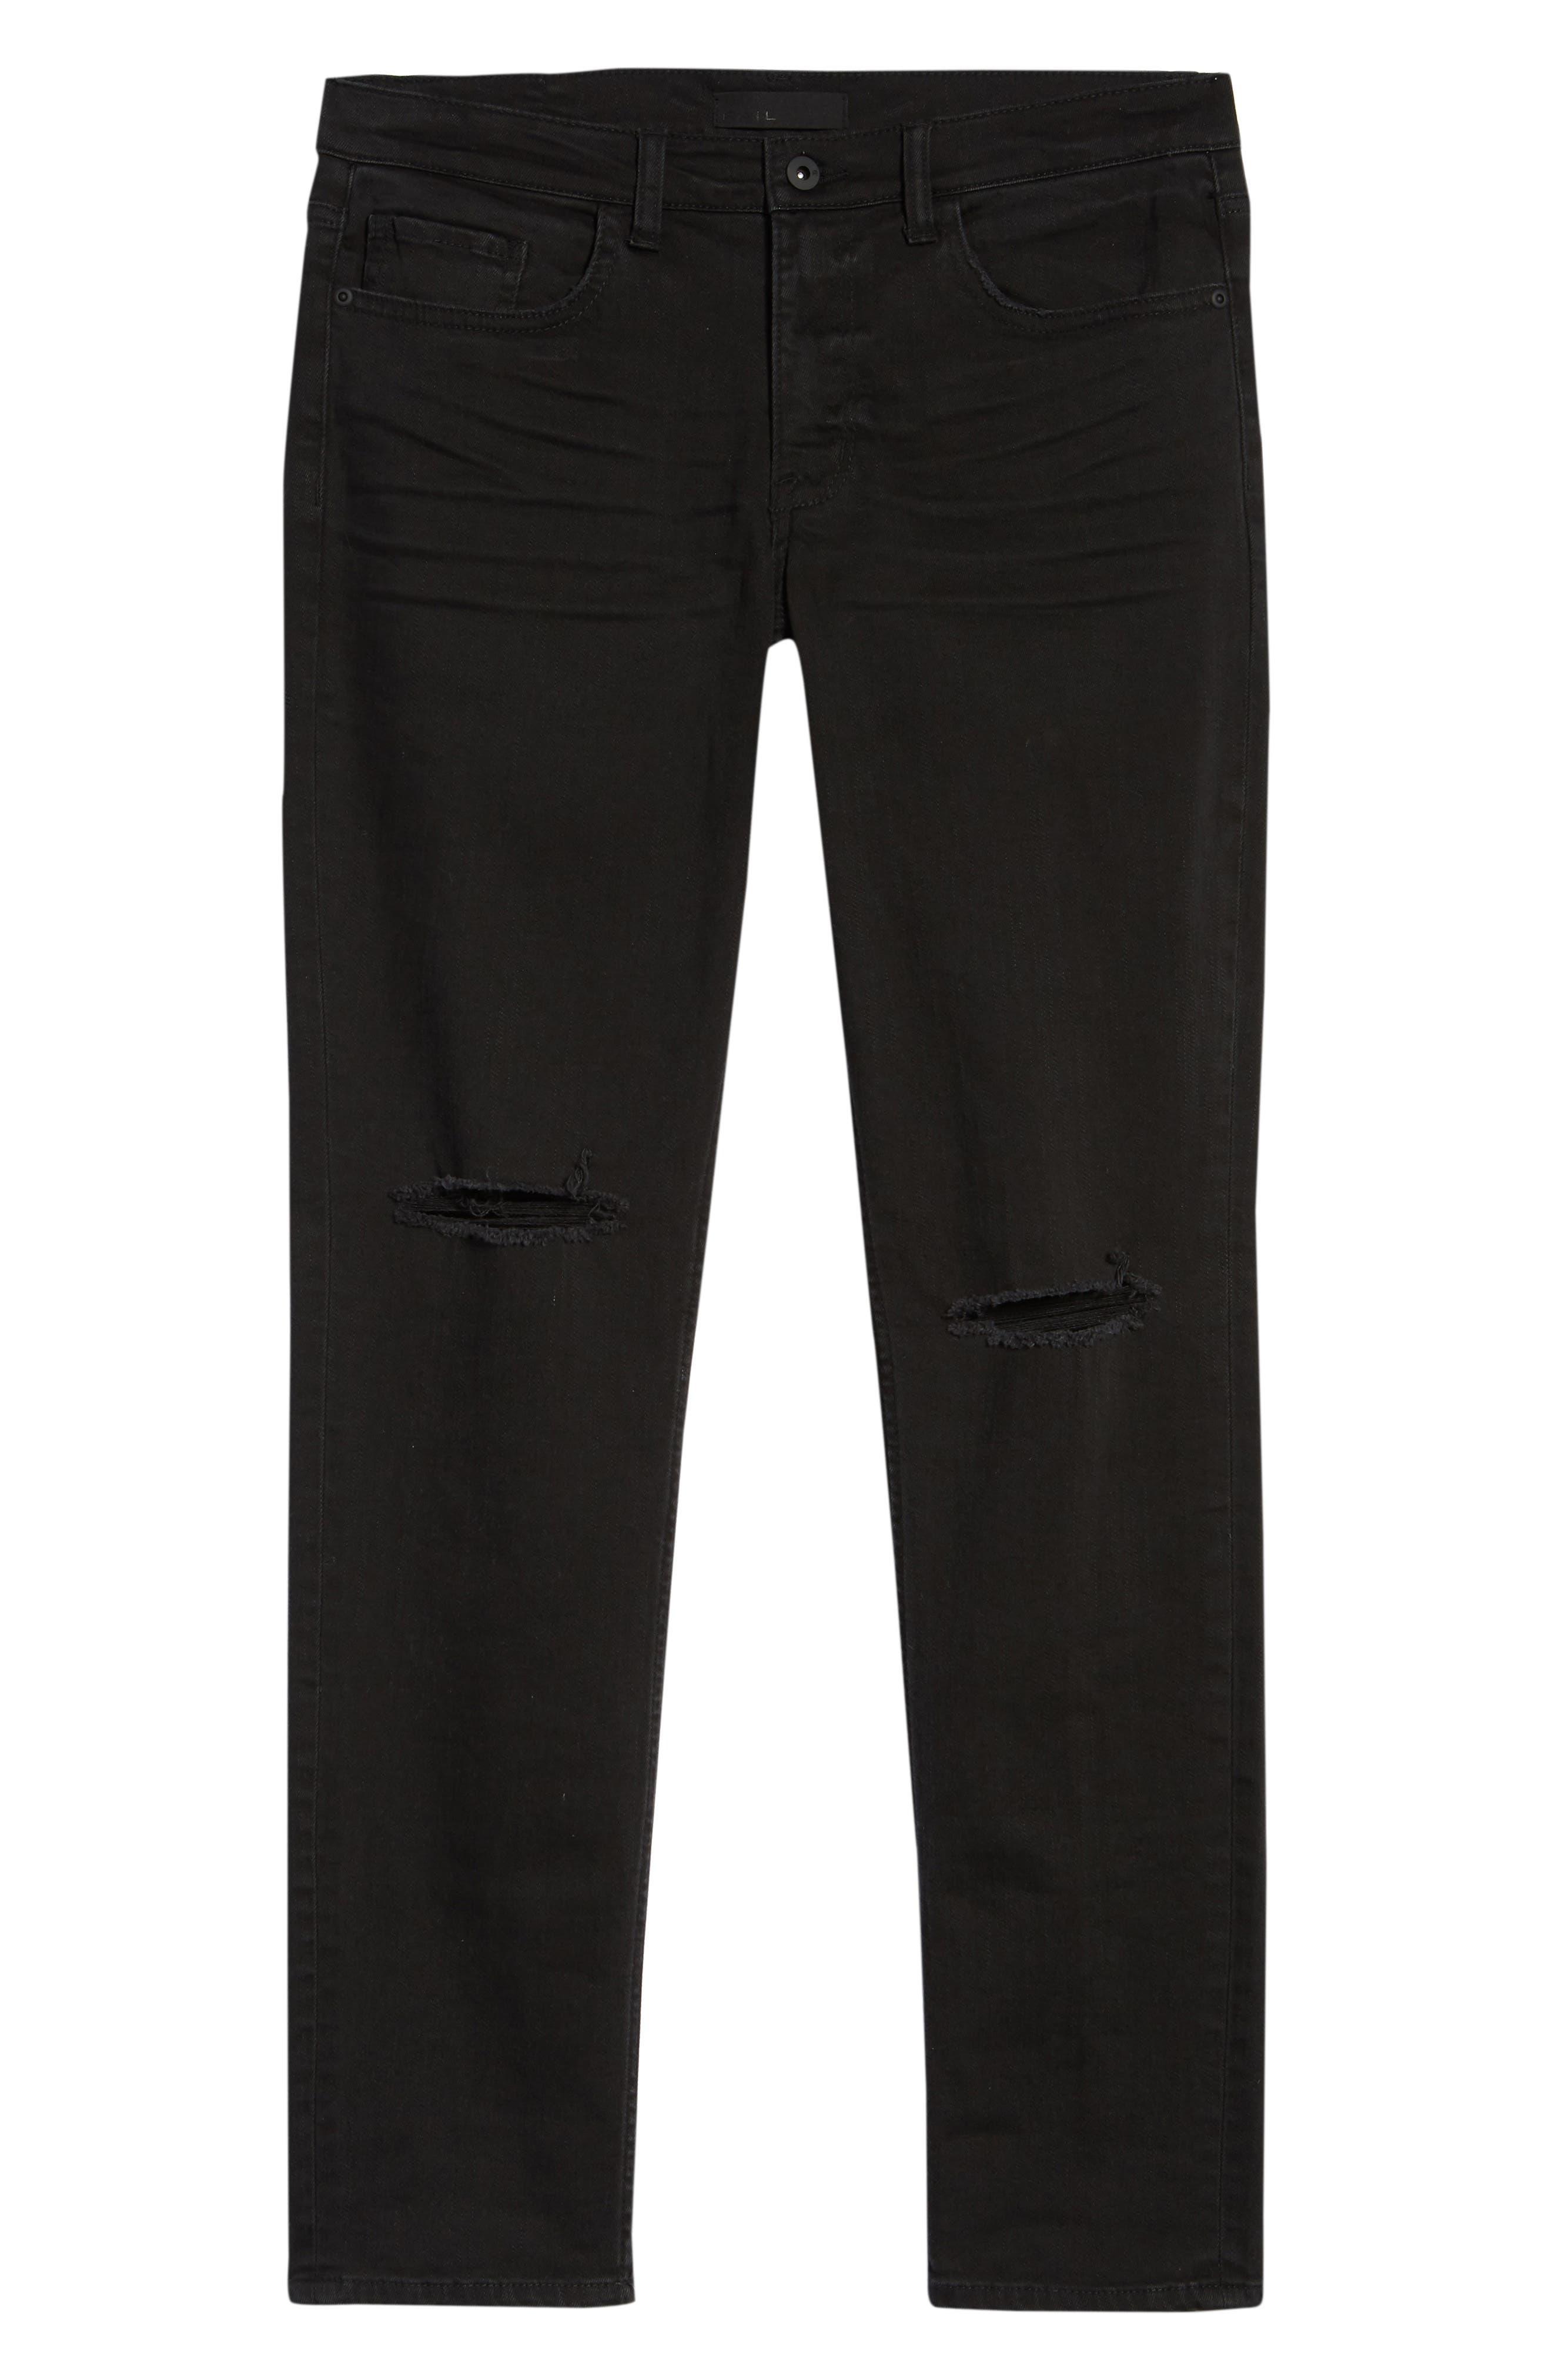 Ripped Skinny Jeans,                             Alternate thumbnail 6, color,                             BLACK STONE WASH